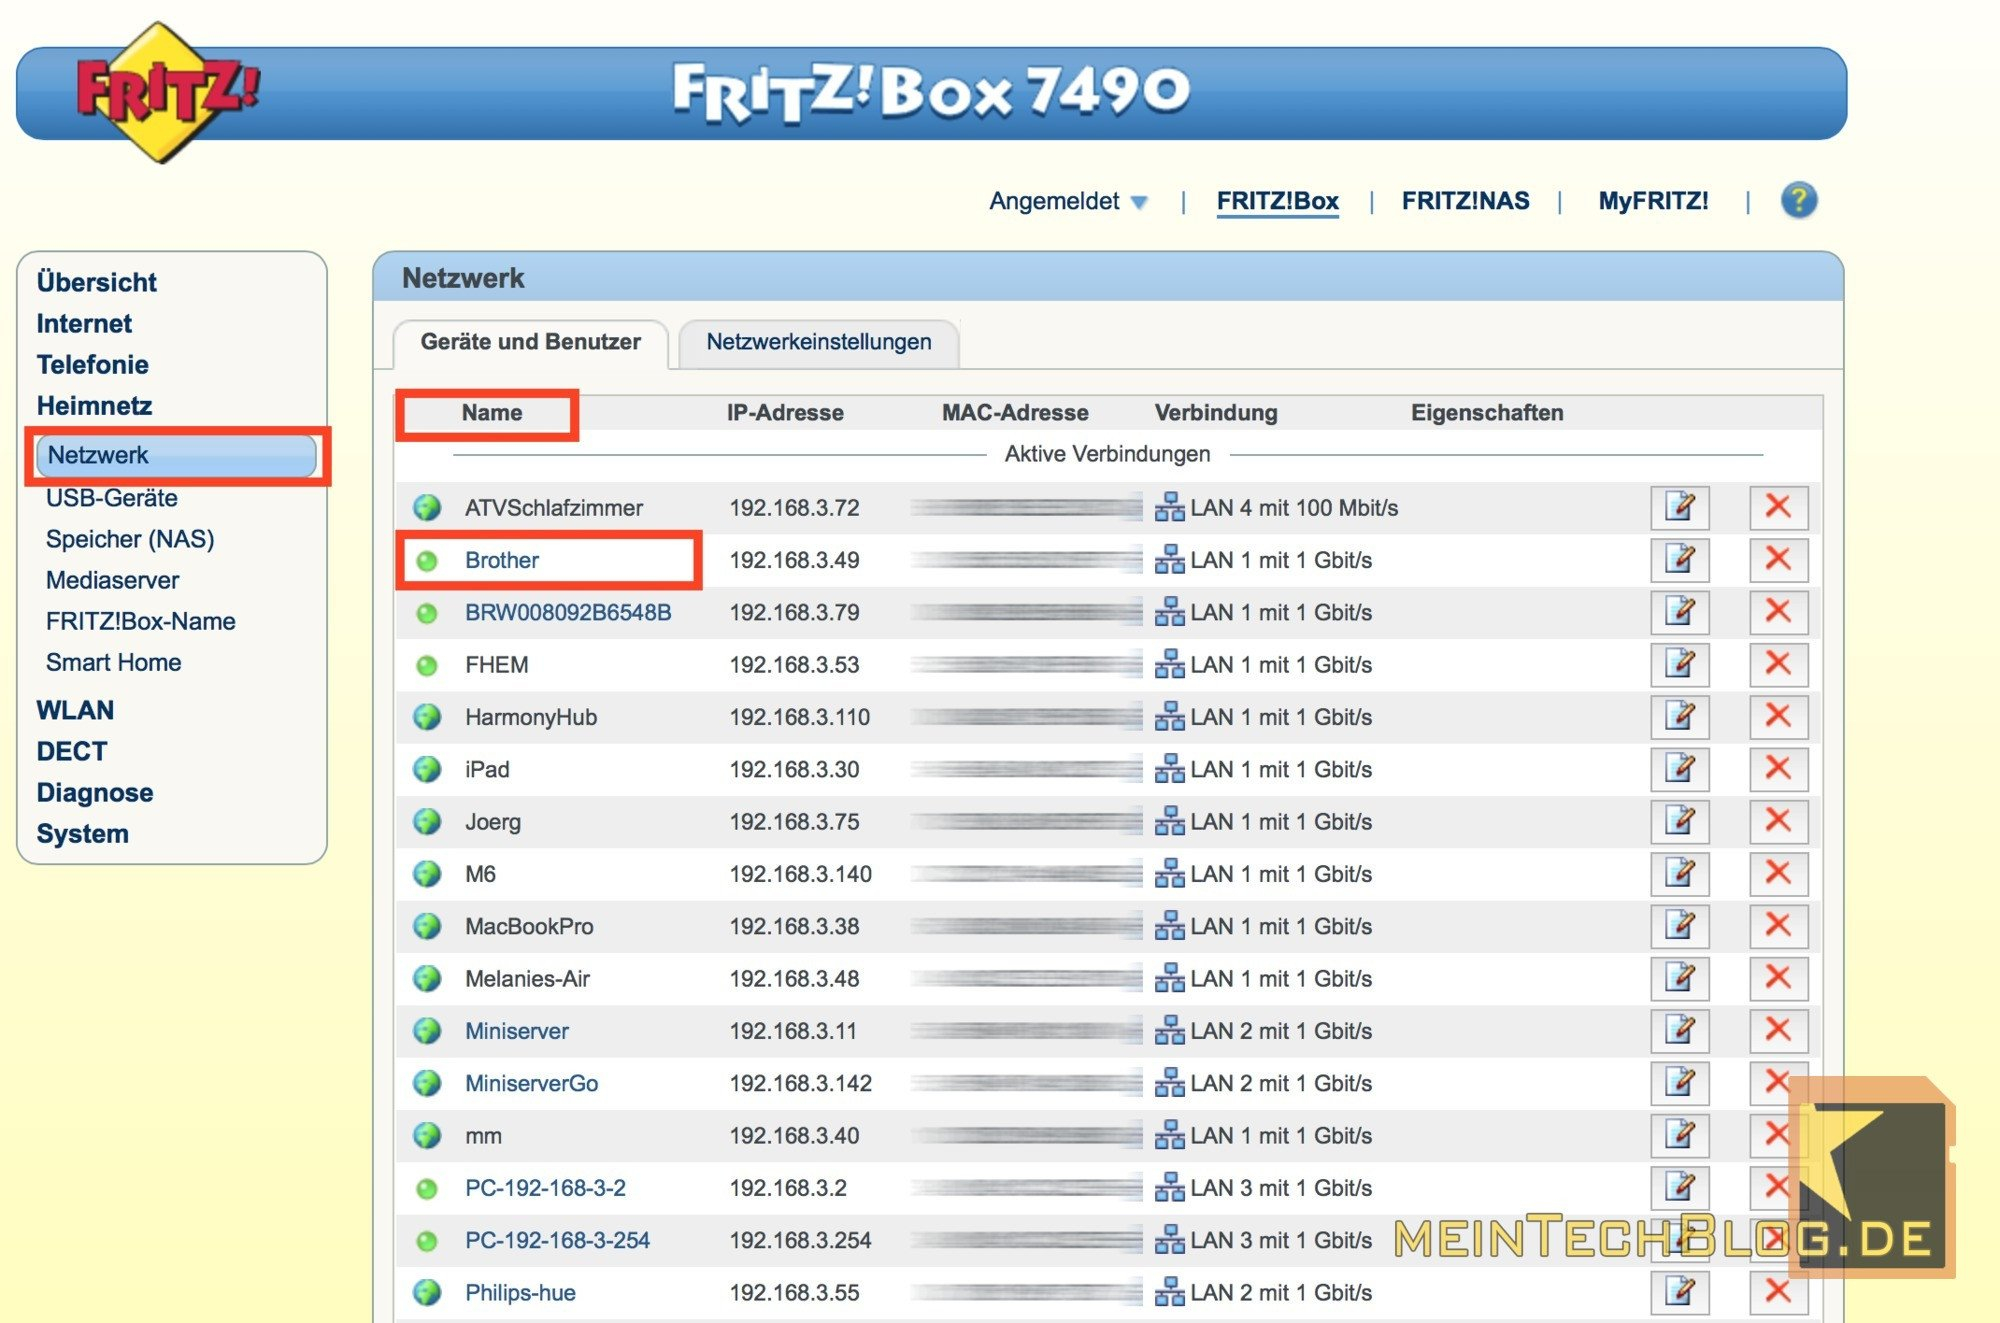 Ip Address Spreadsheet Template Free Templates – Ebnefsi.eu For Ip Address Spreadsheet Template